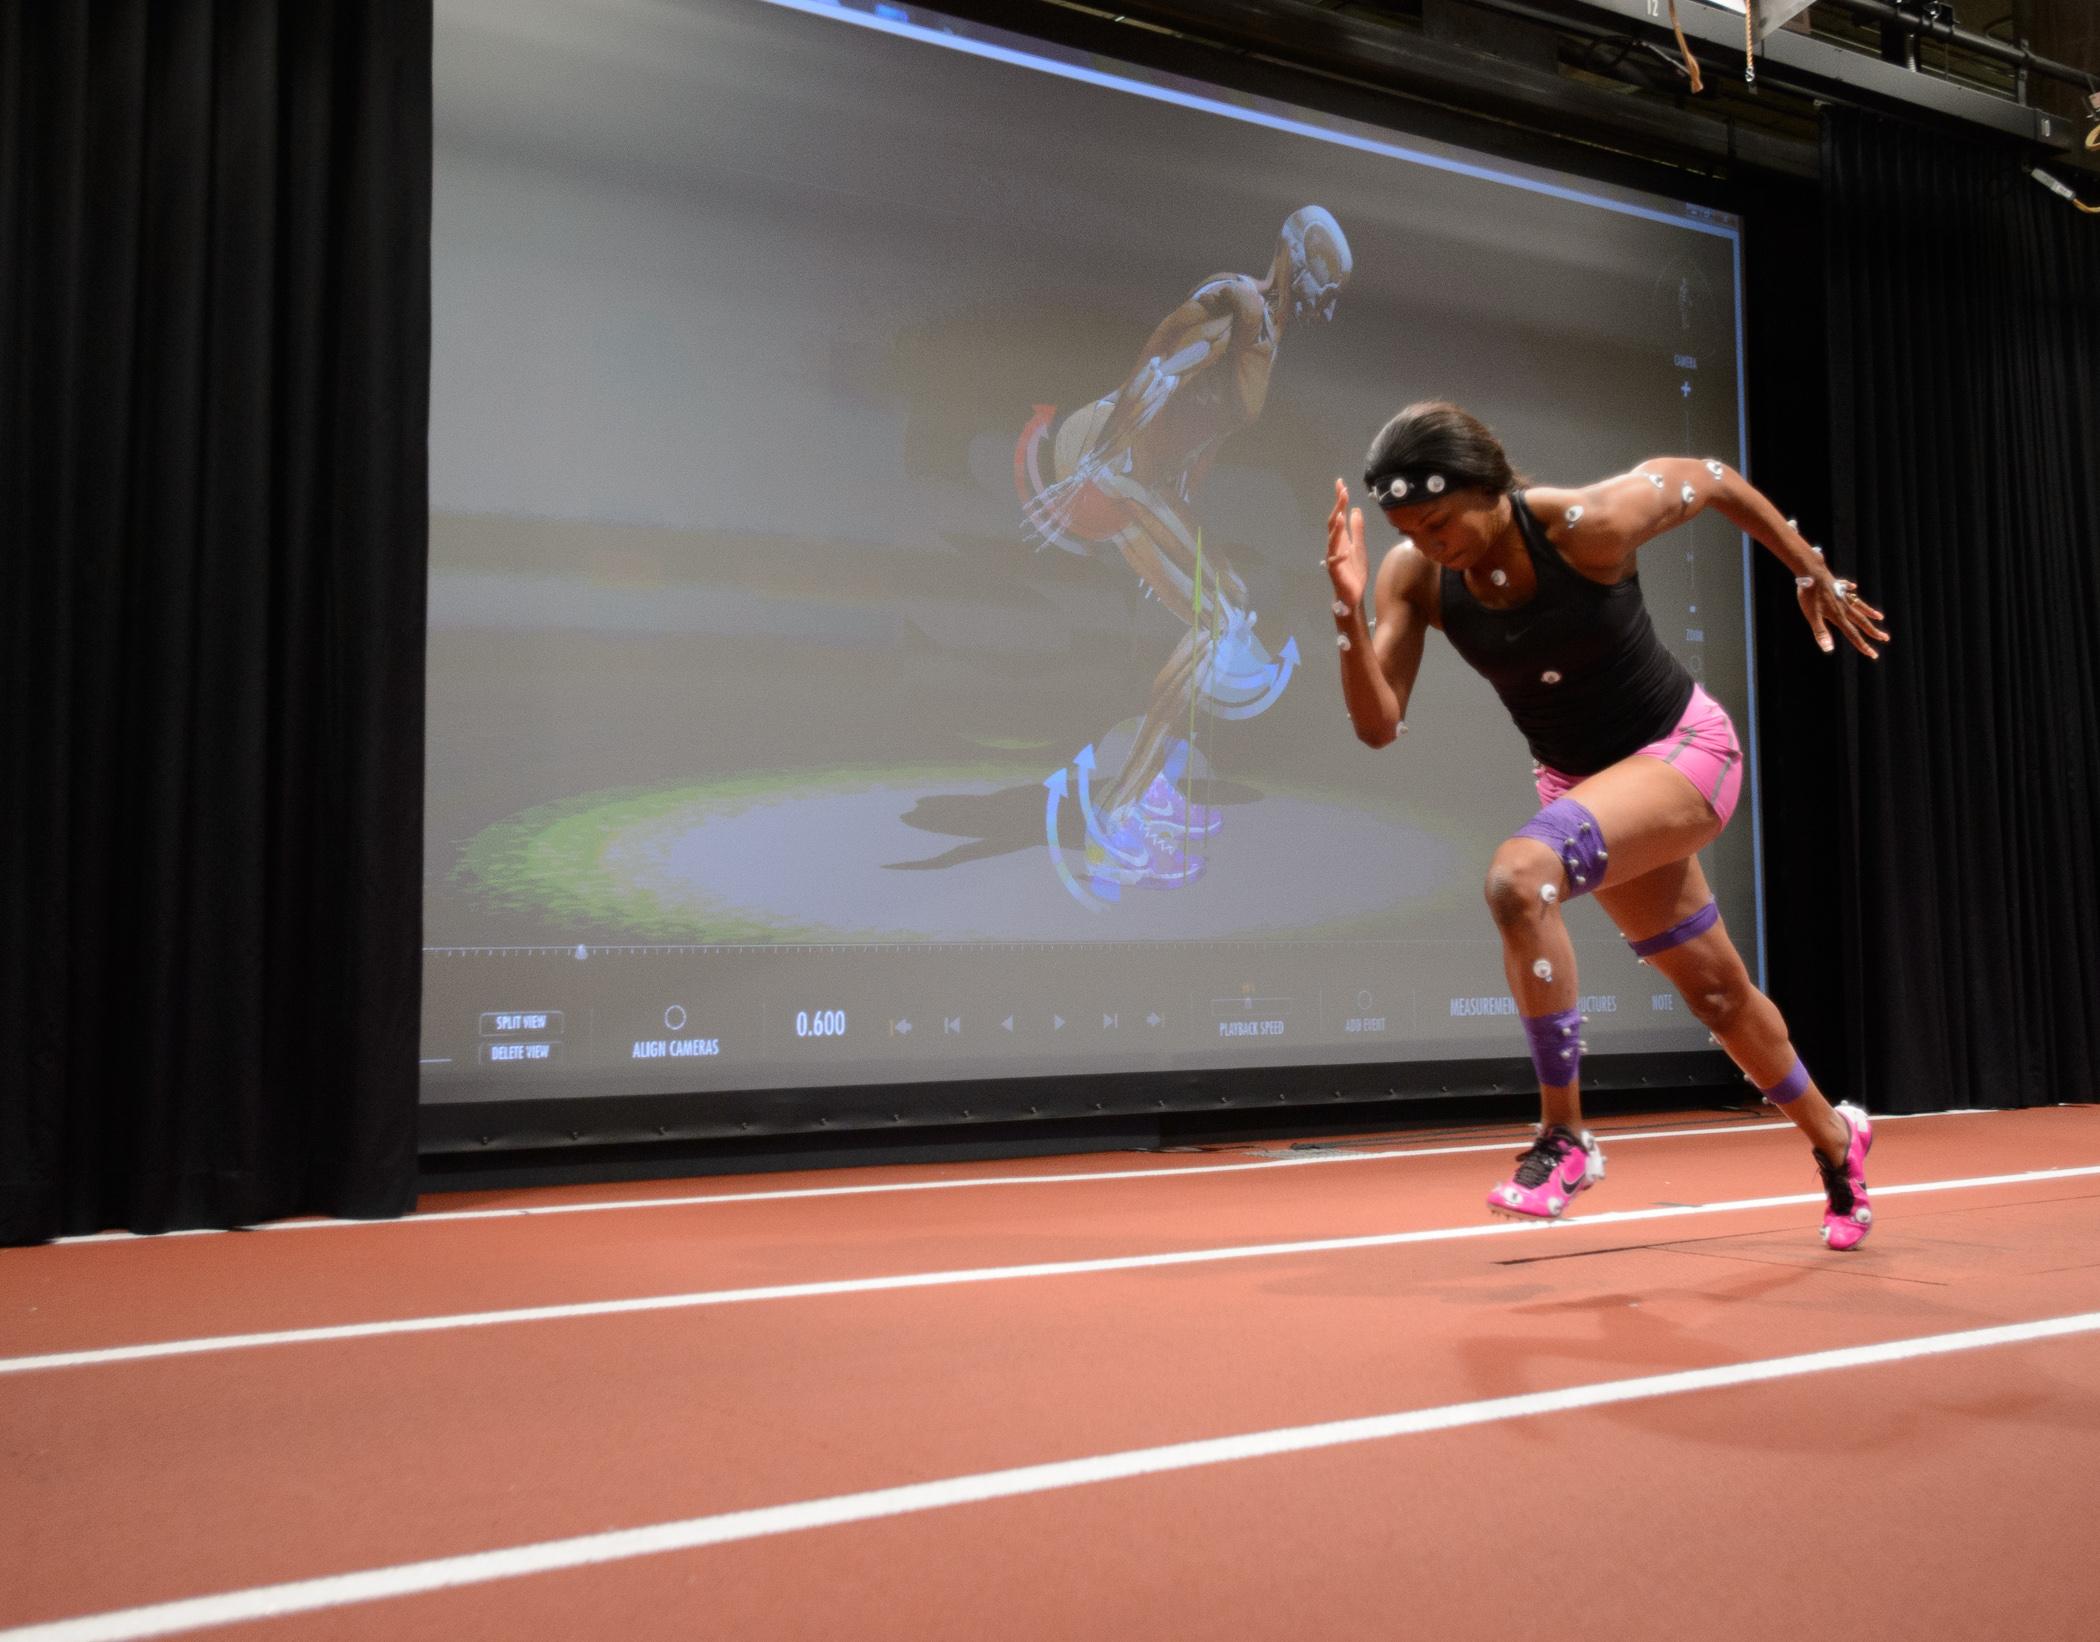 Nike Sport Research Lab Incubates Innovation - Nike News